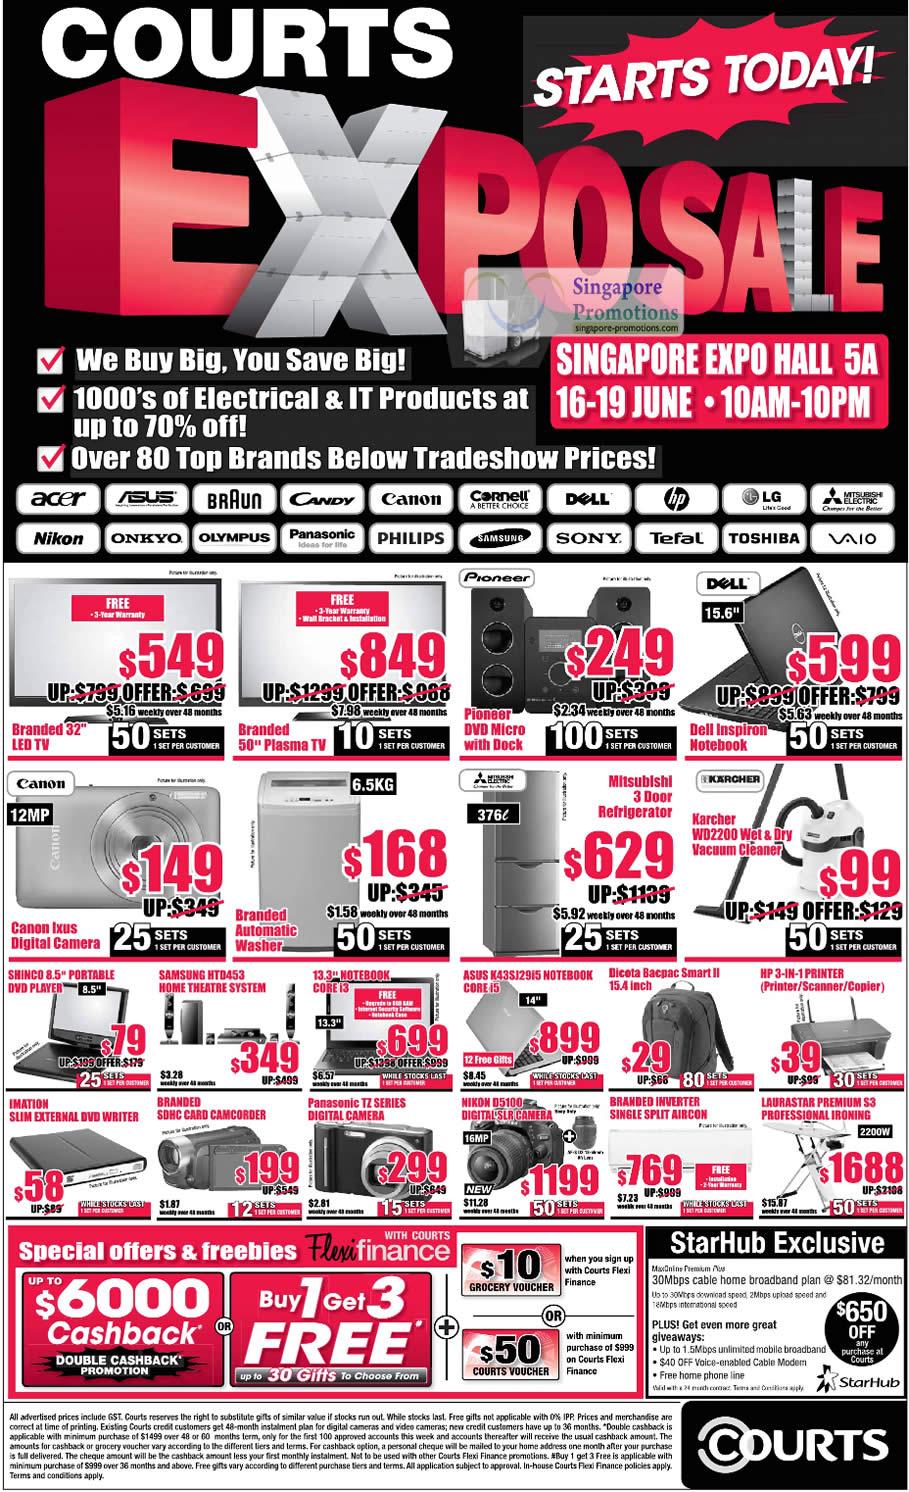 16 Jun TV, LED, Plasma, Pioneer, Dell Inspiron Notebook, Canon Ixus Digital Camera, Washing Machines, Karcher WD2200, Samsung HTD463, ASUS K43SJ29i5, Nikon D5100